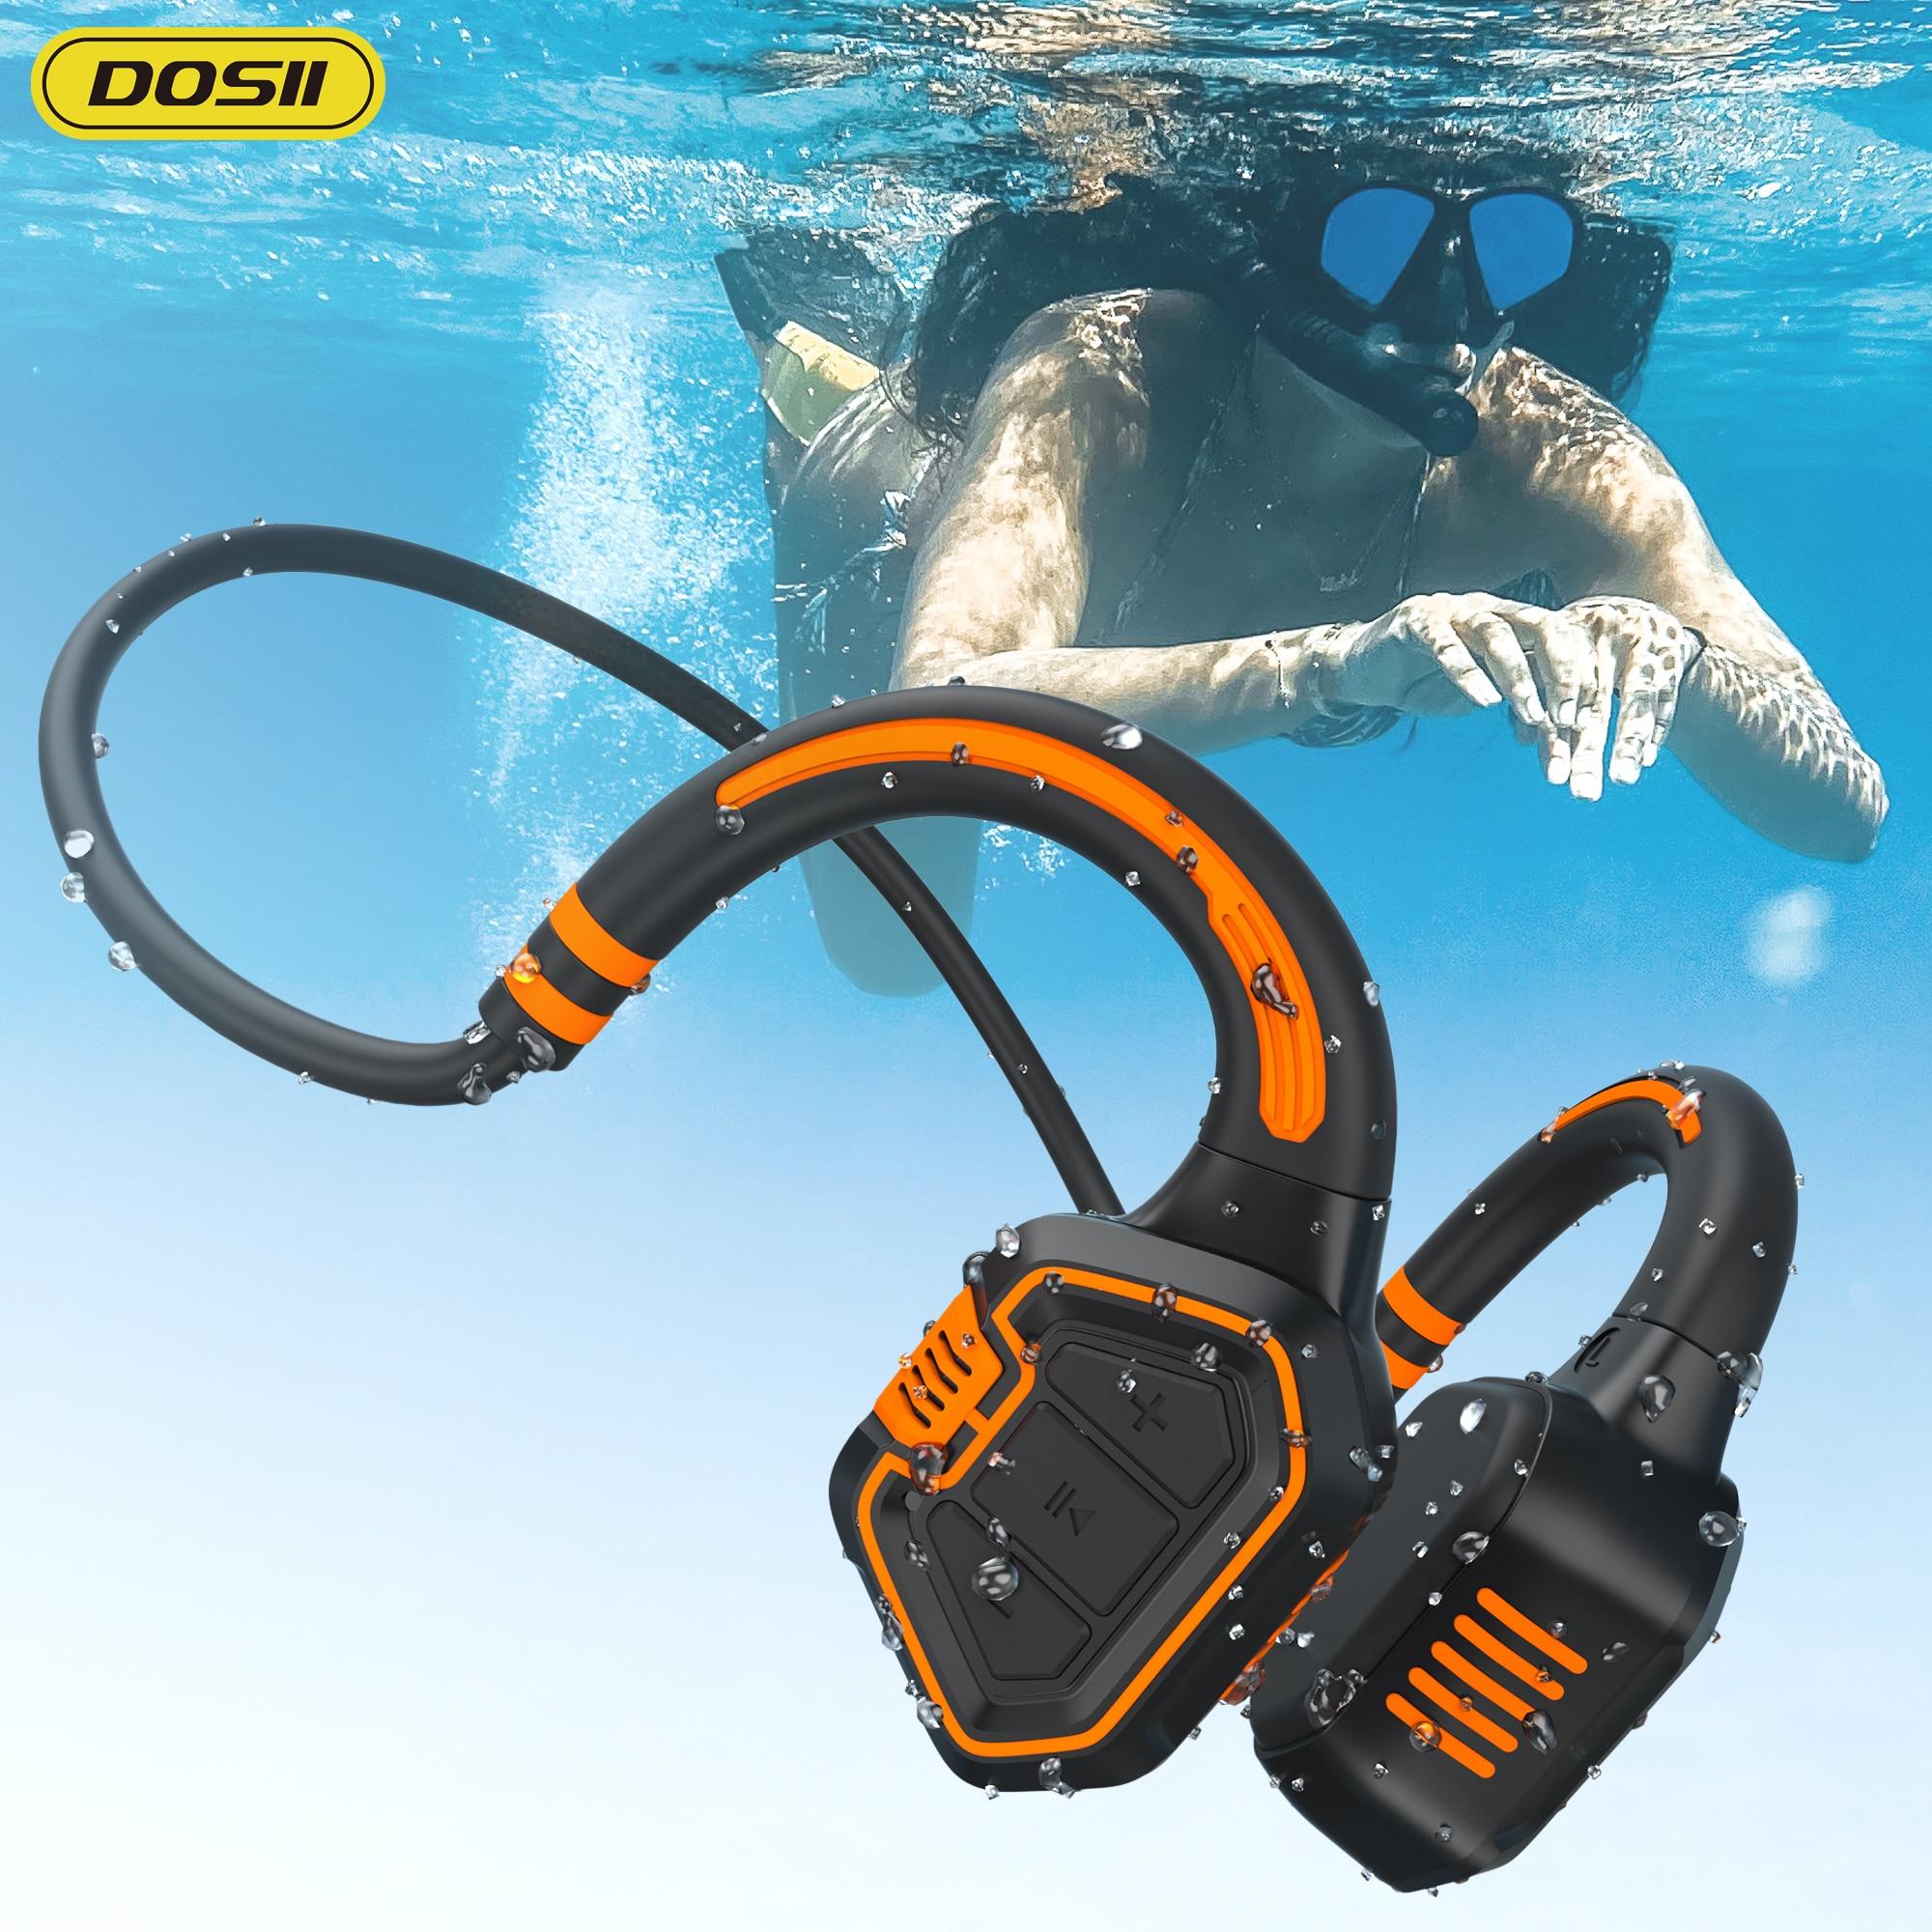 For xiaomi Huawei Bone Conduction Earphone IPX8 Waterproof Wireless Headphones Sports Outdoor Running Earbud Hands-free With Mic